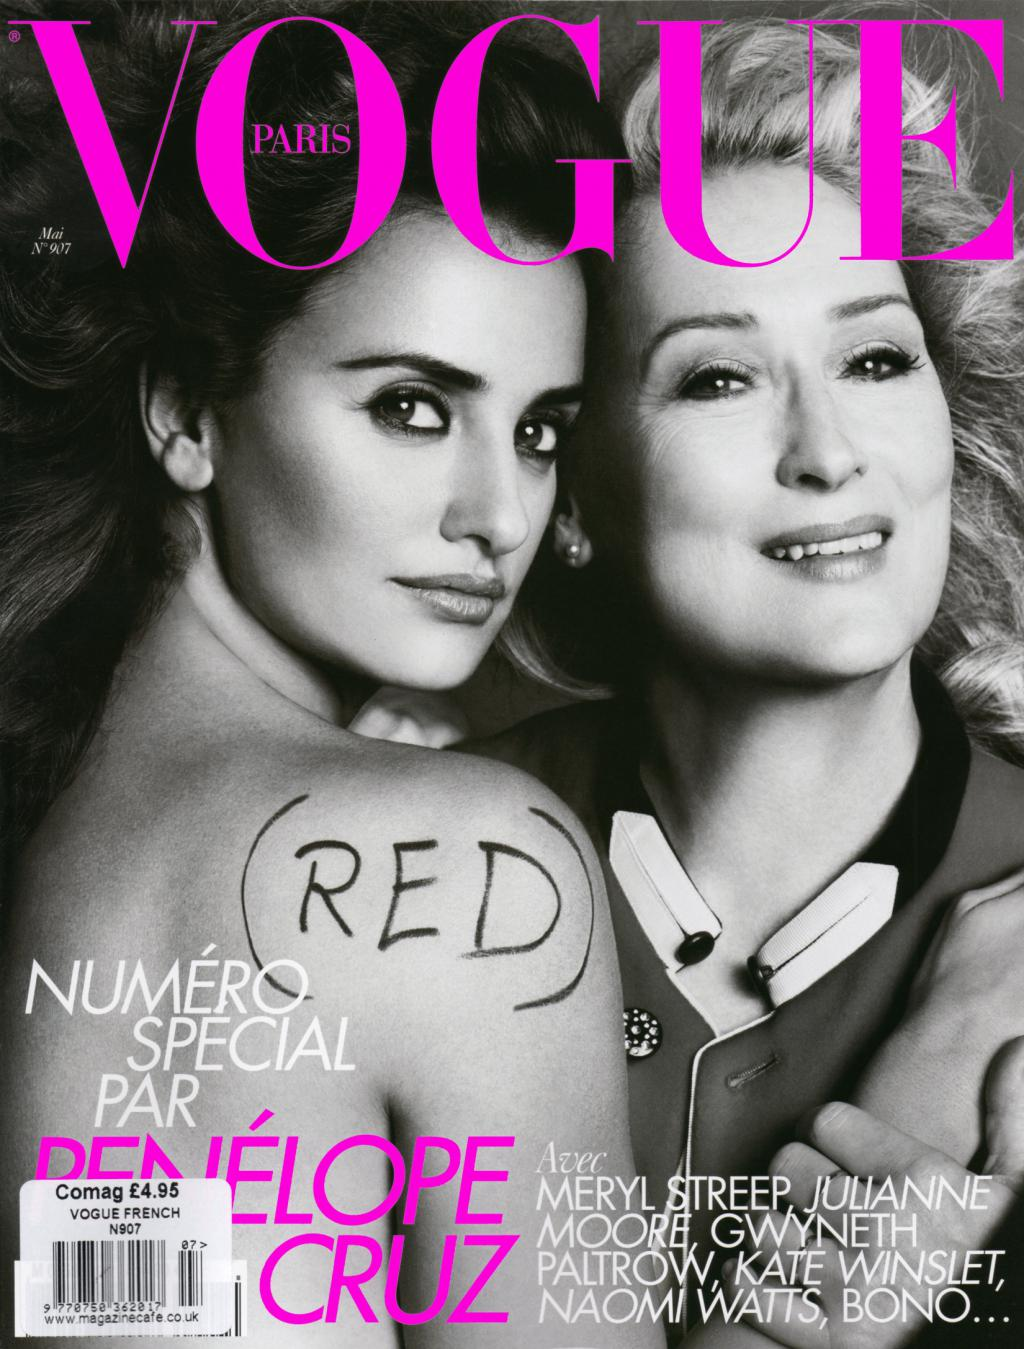 http://3.bp.blogspot.com/_eg2I5vDRaWM/S-Fsj96o19I/AAAAAAAALDE/HHOziecozKg/s1600/Vogue+Paris+-+Penelope+Cruz+%26+Meryl+Streep+by+Inez+%26+Vinoodh.jpg